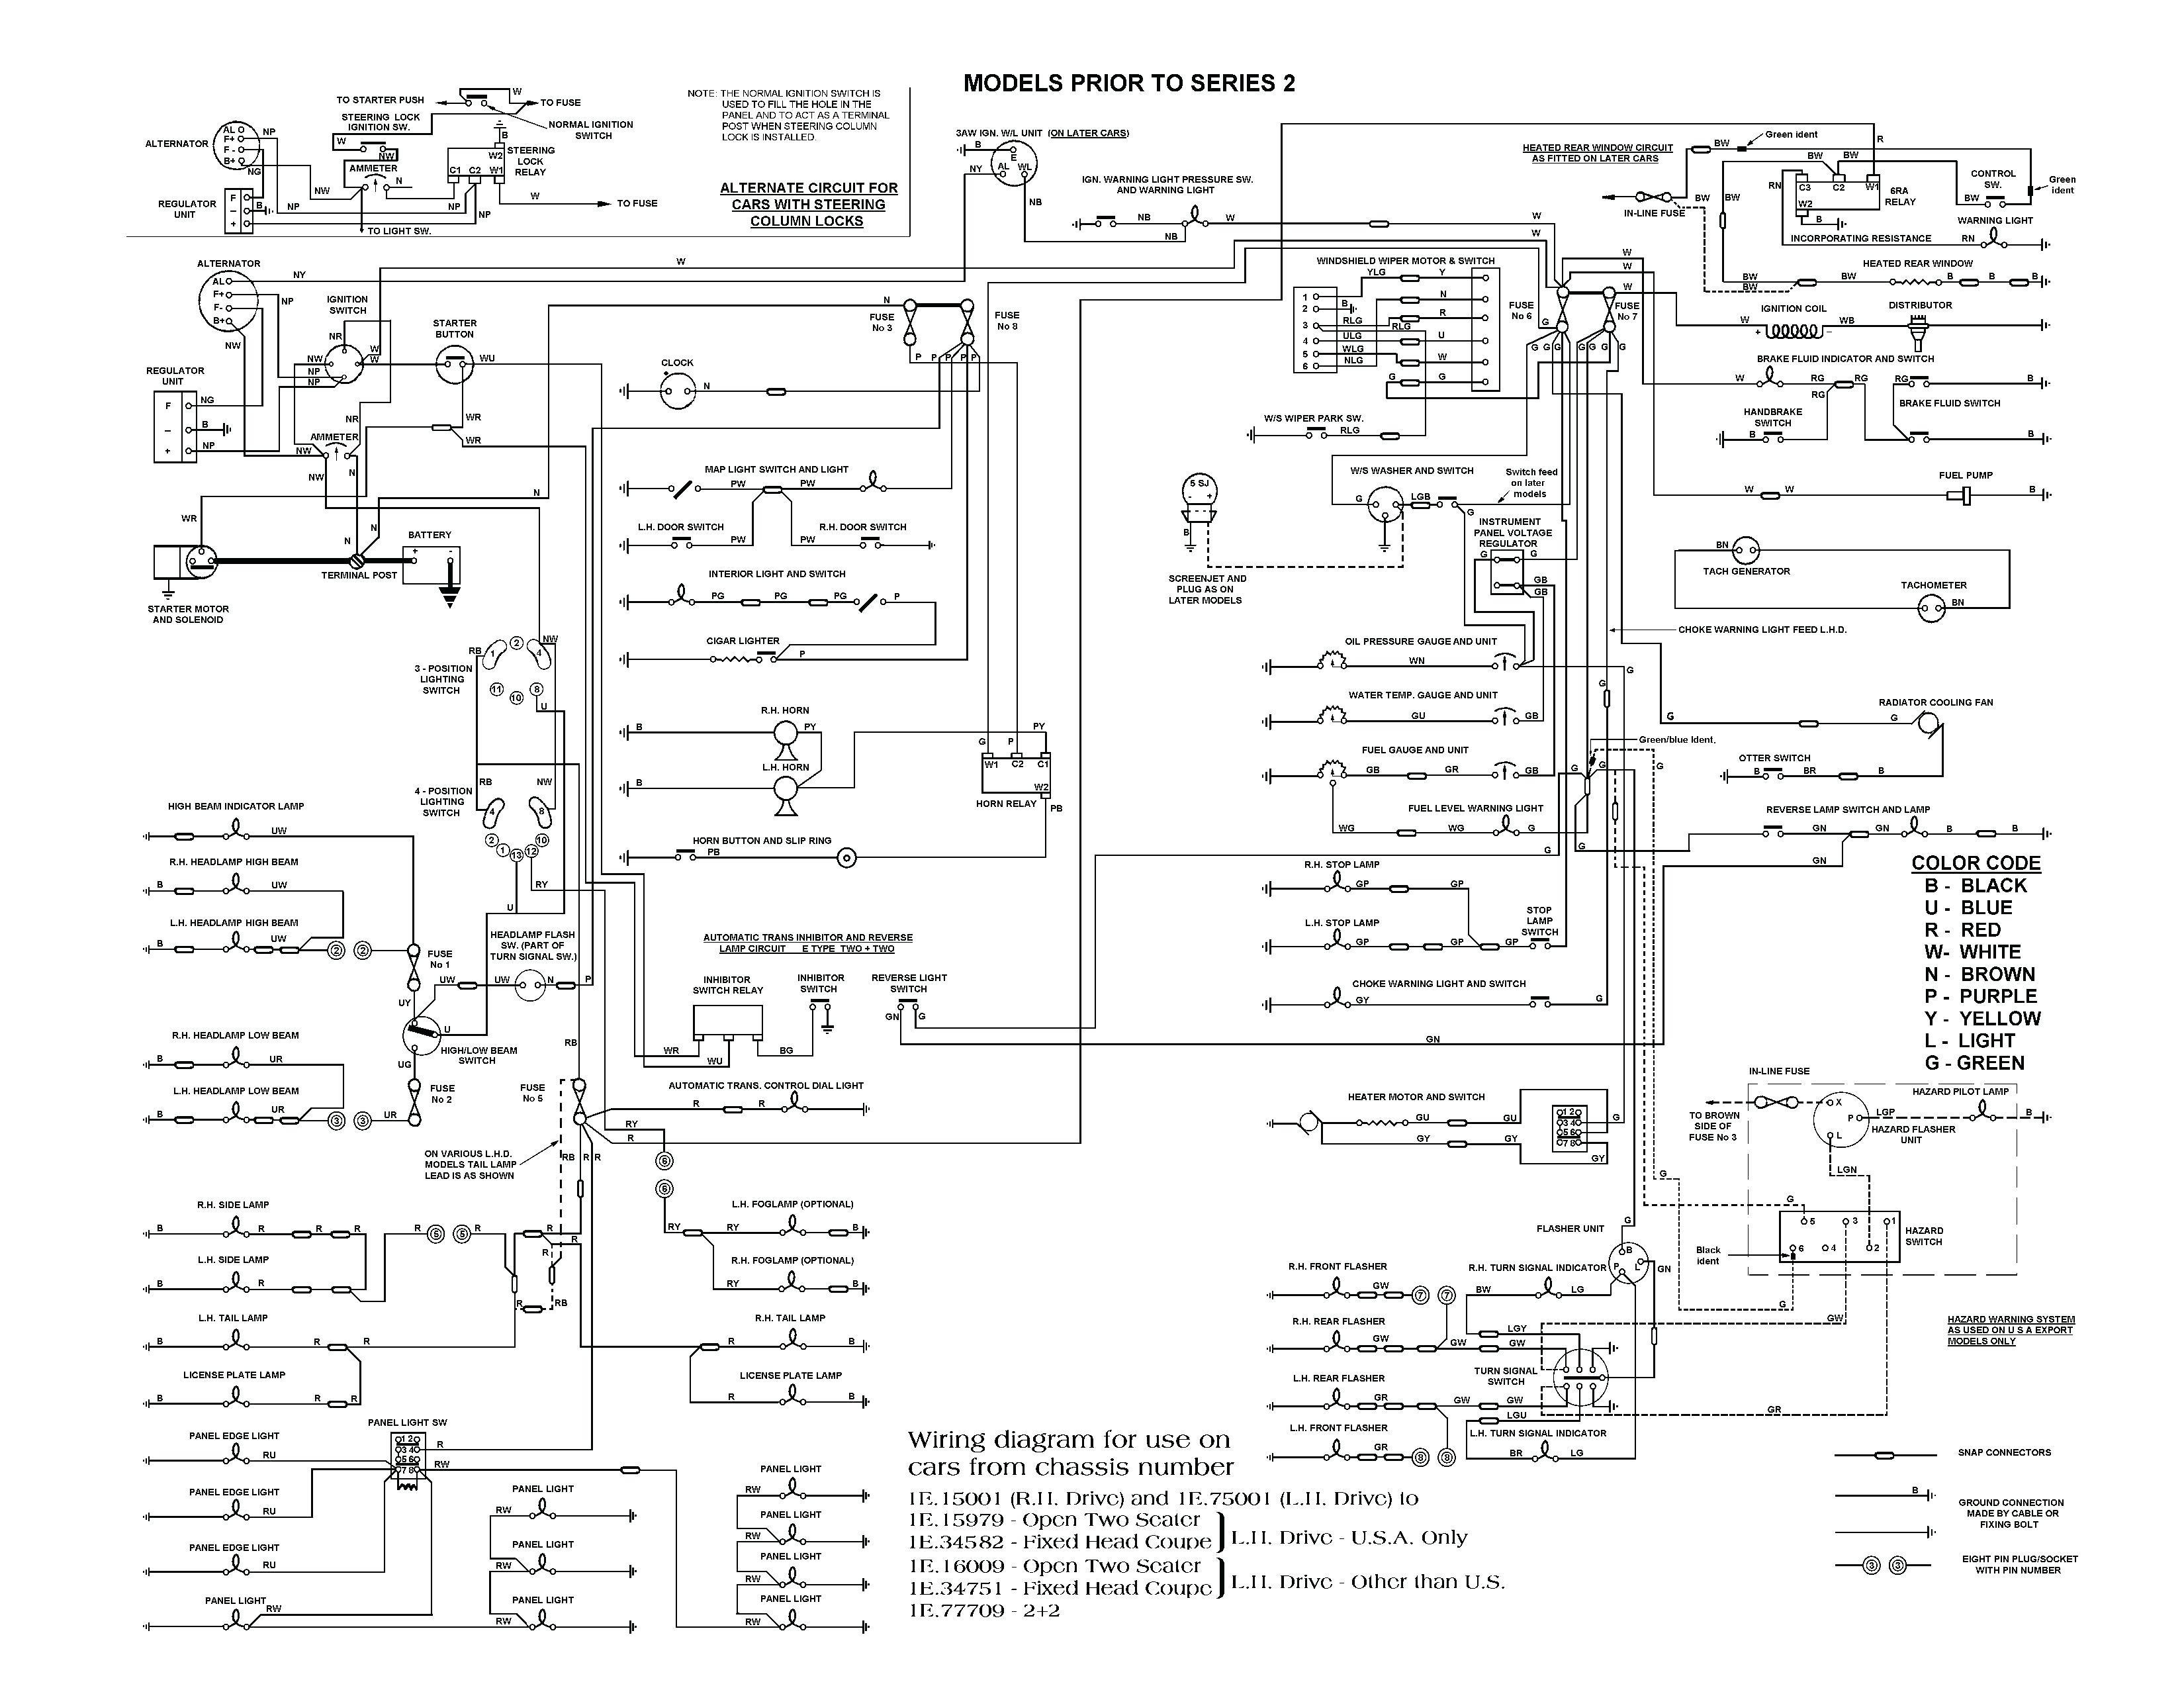 Fuel Gauge Diagram E Type Fuel Temp Oil Ammeter Gauge Wiring Diagram Symbols Jaguar Xf Of Fuel Gauge Diagram